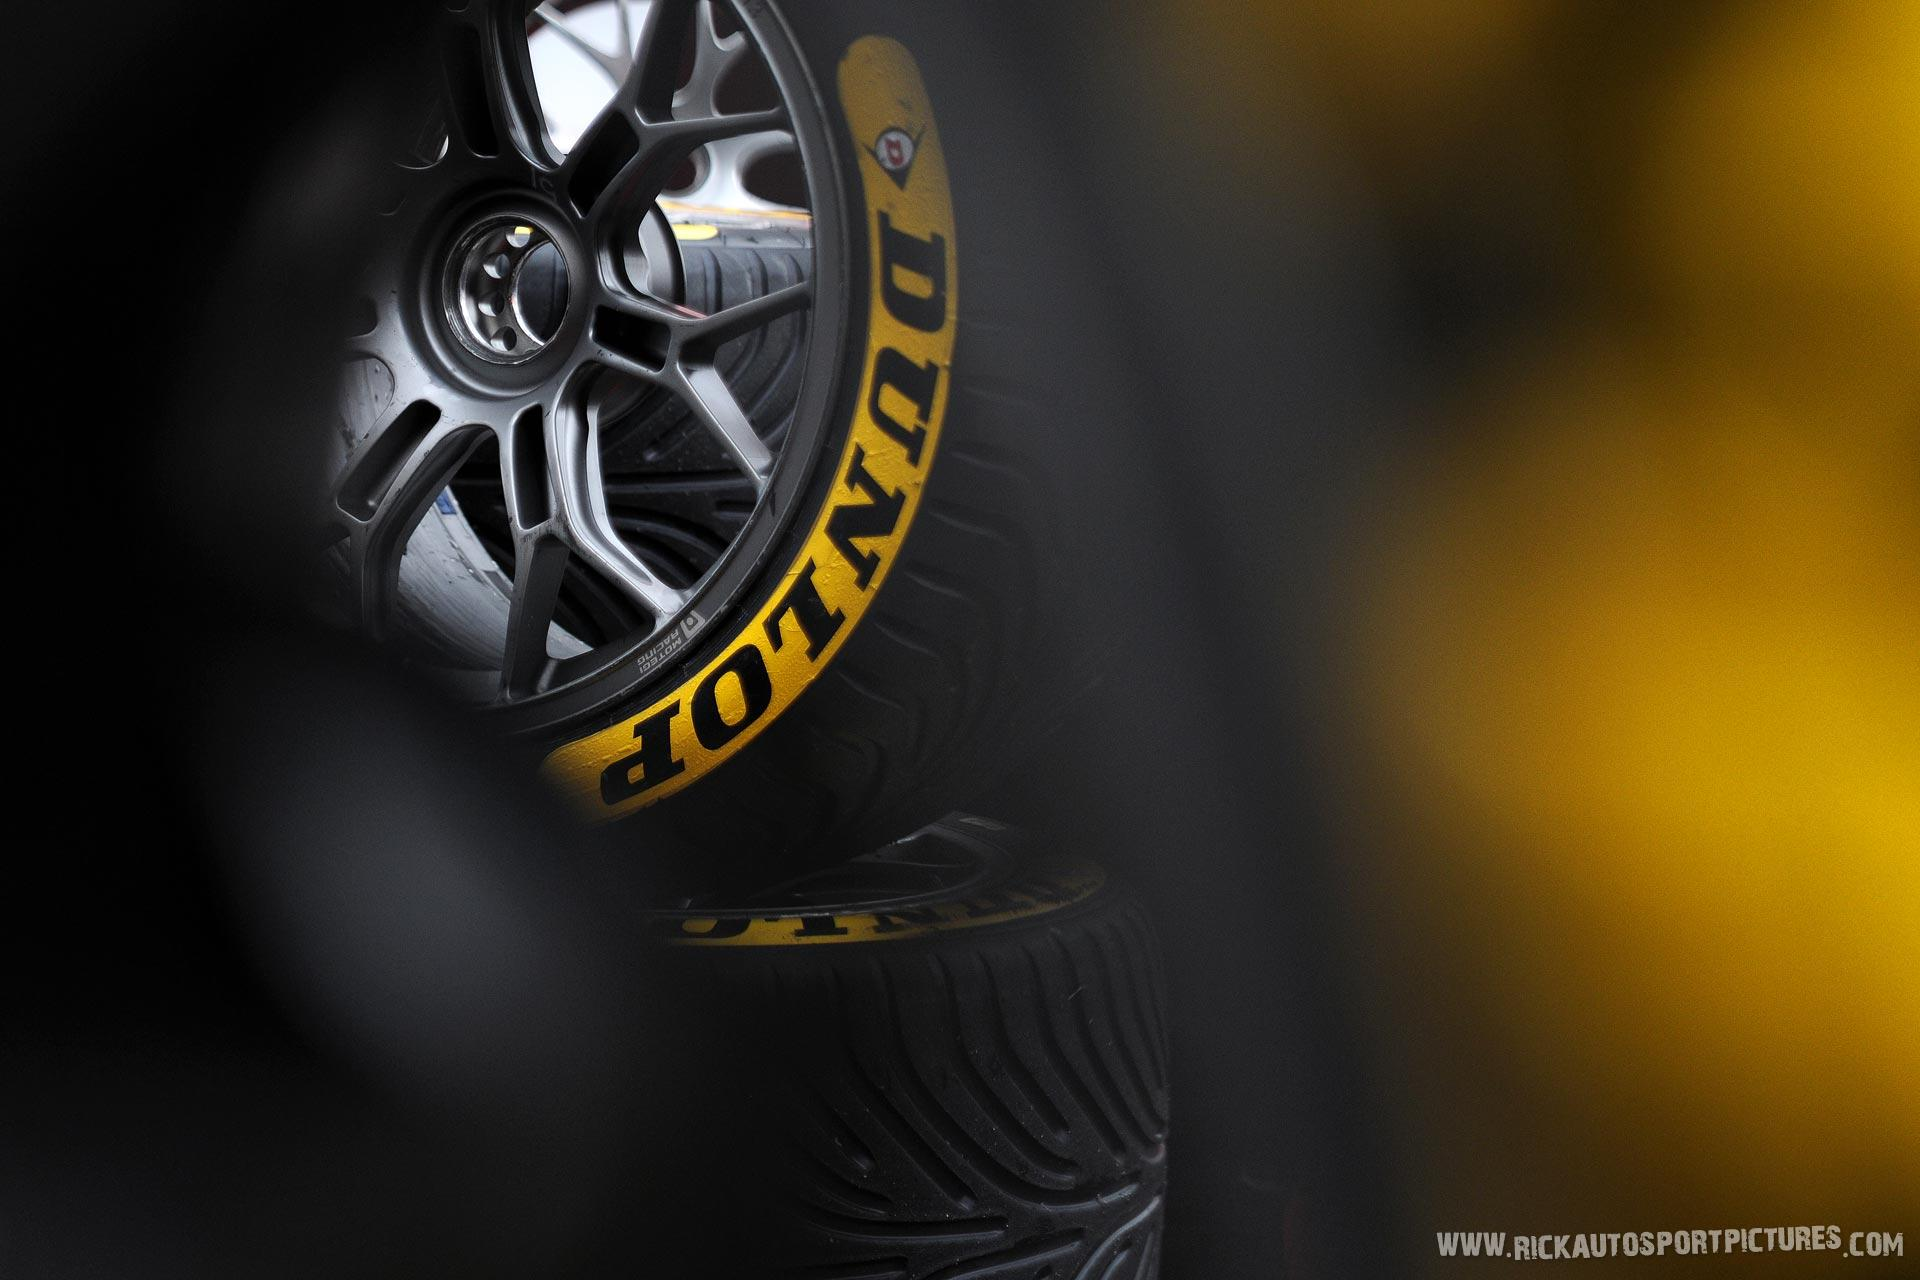 Dunlop Tyres Silverstone 2016